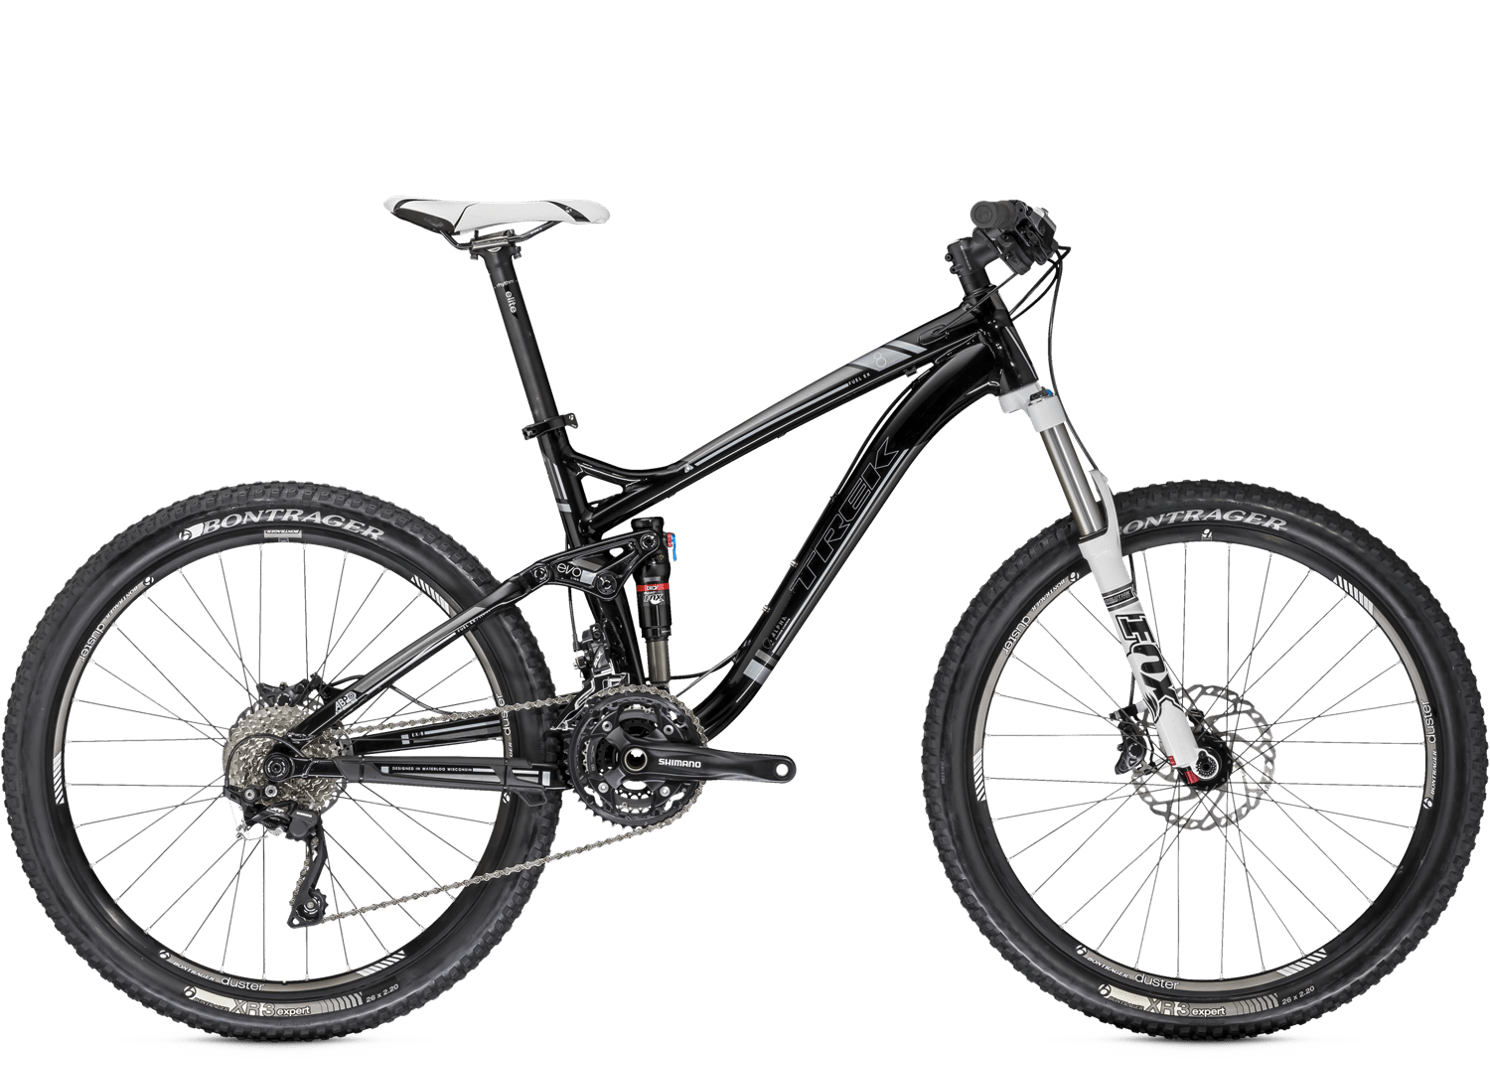 2014 Trek Fuel EX 8 26